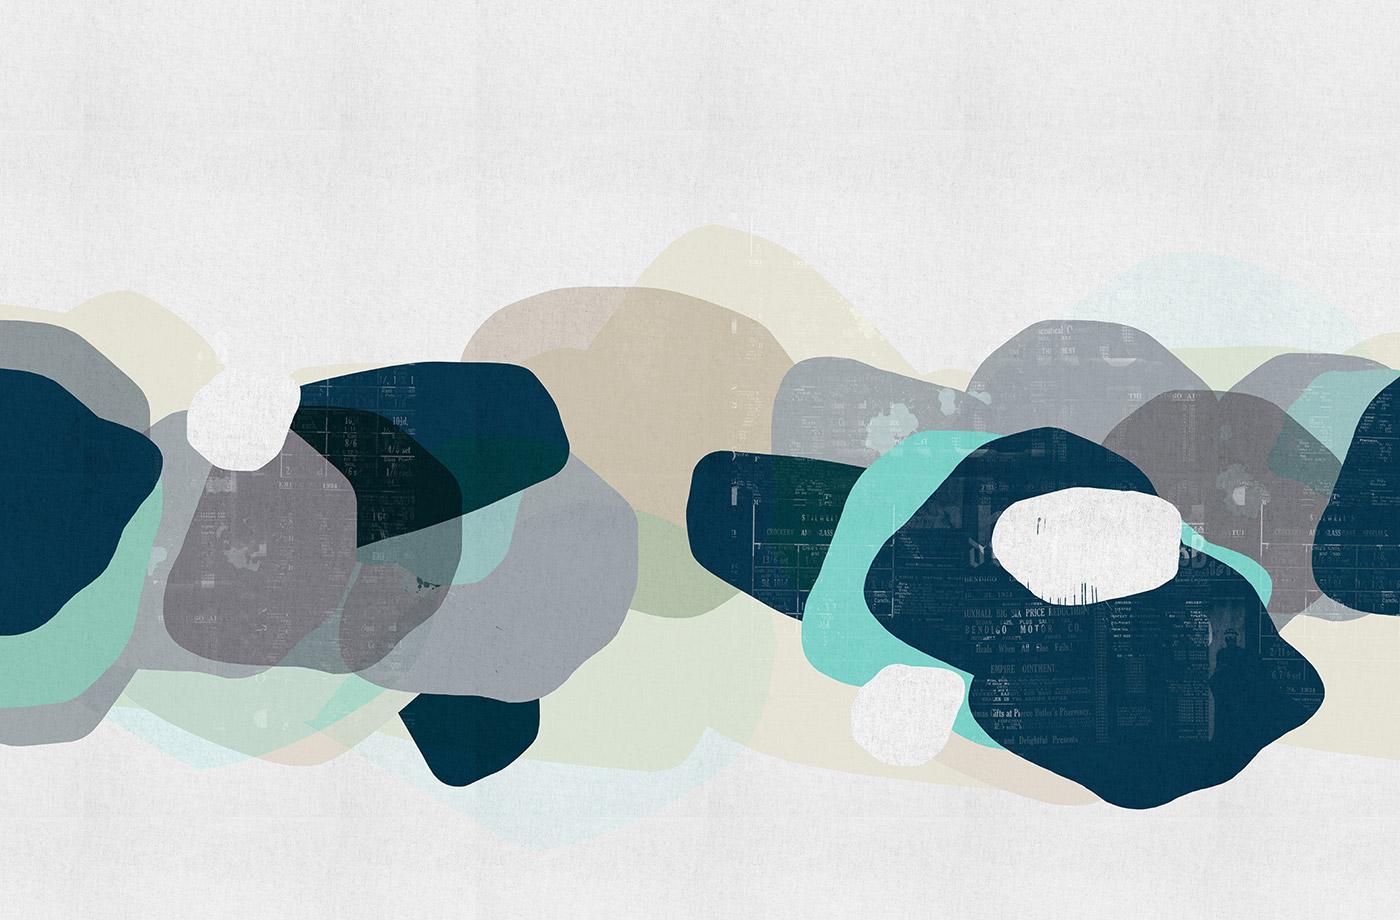 Cool Ridge  , 2015   Pigment print on archival rag  95cm x 140cm / 1 of 15 65cm x 95cm / 1 of 50 50cm x 70cm / 1of 100